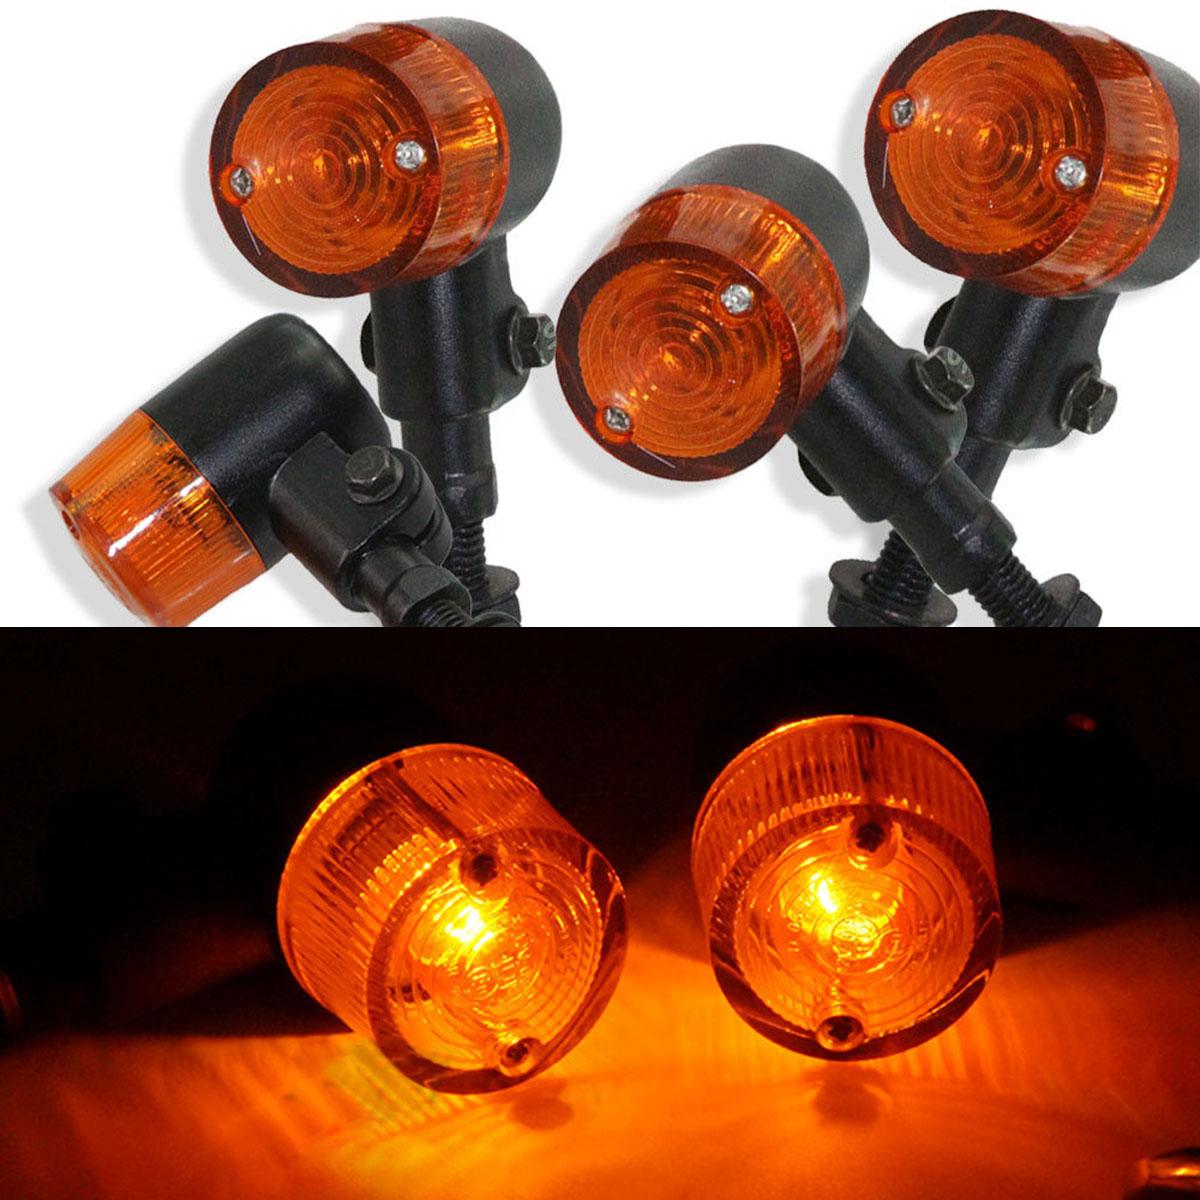 4X Metal Motorcycle Bullet Indicator Light Turn Signal Lamp For Harley Bobber